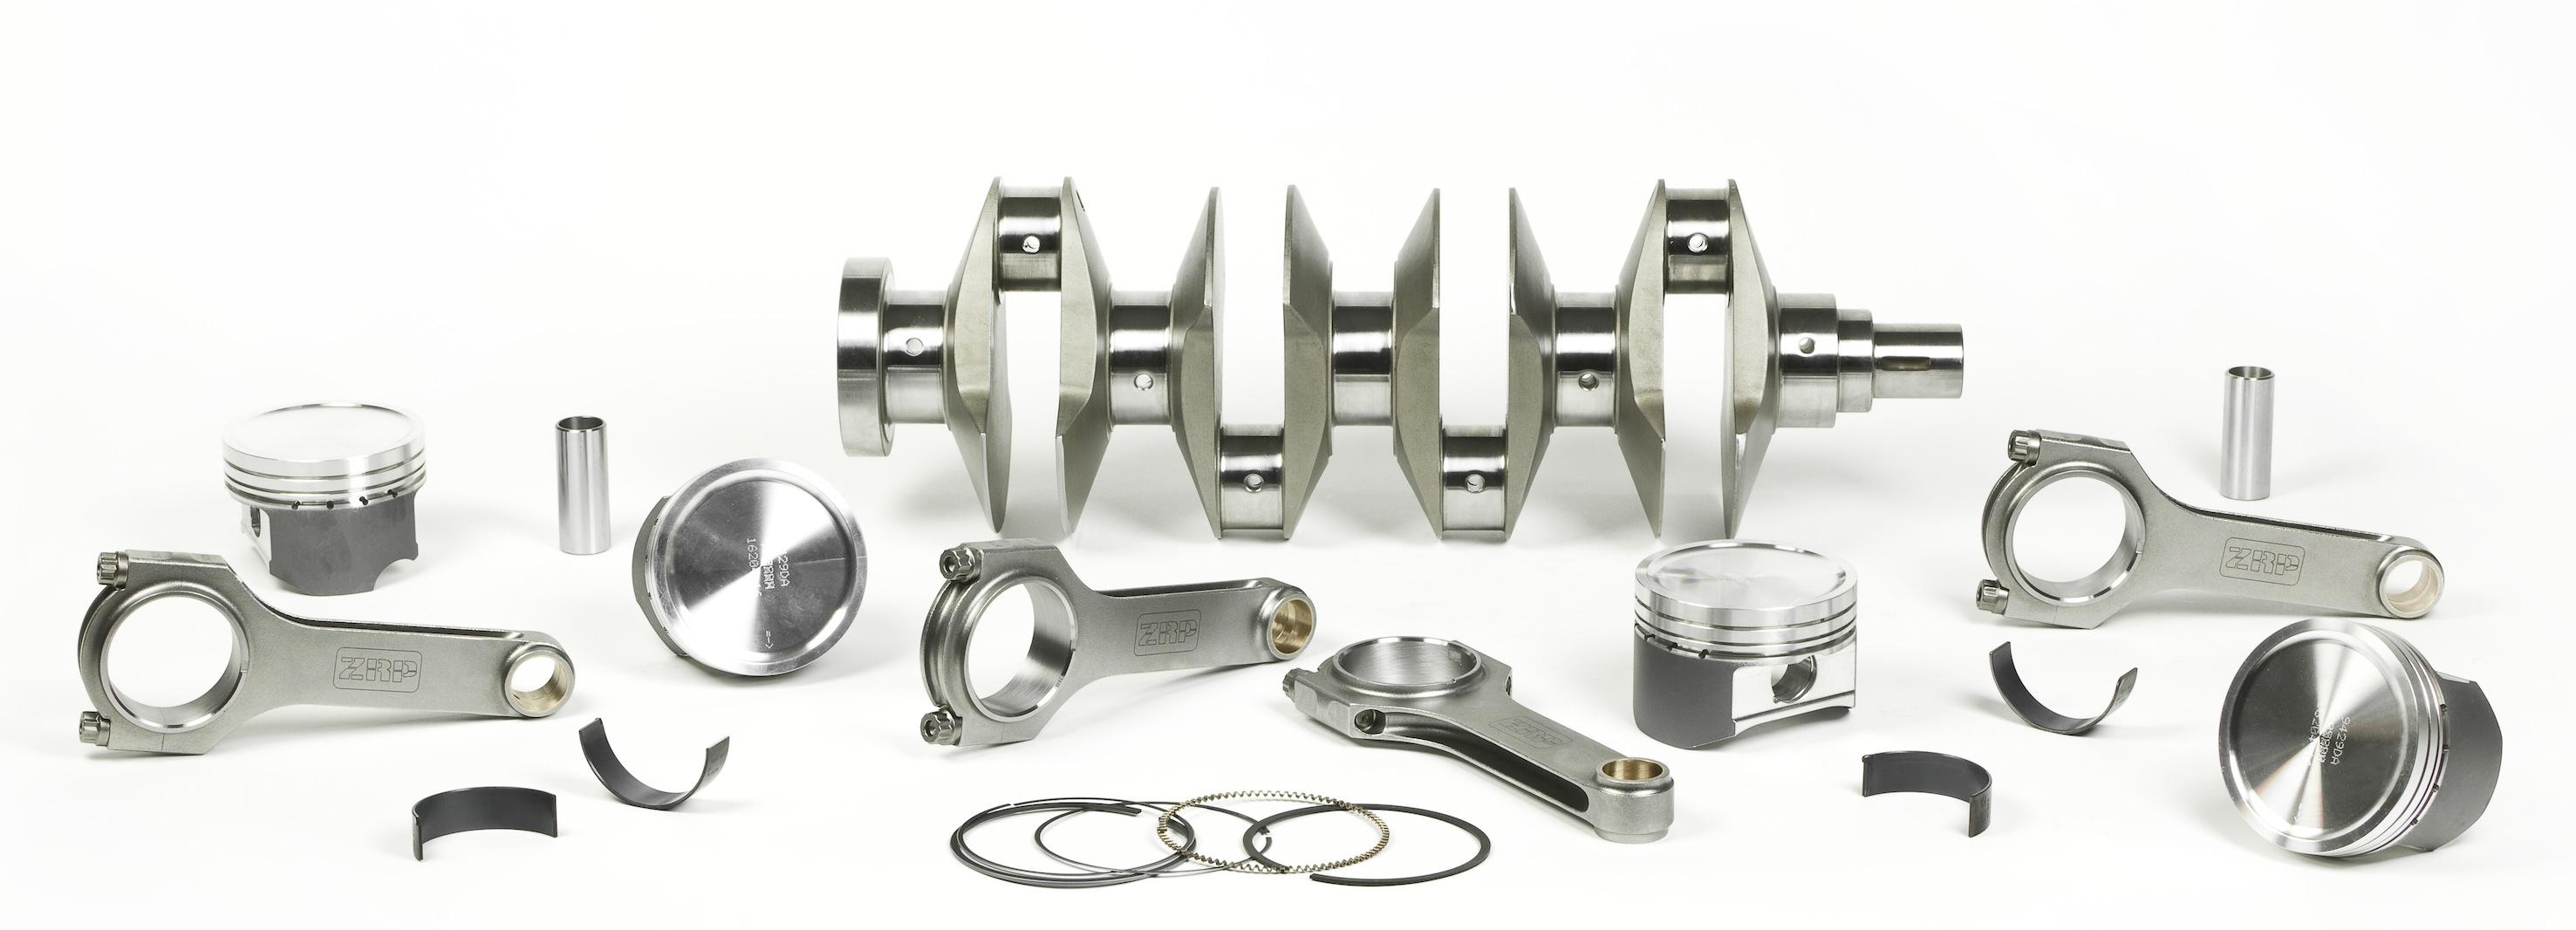 Stroker Kit for Nissan SR20 DE/DET Conversion to 2 2Ltr